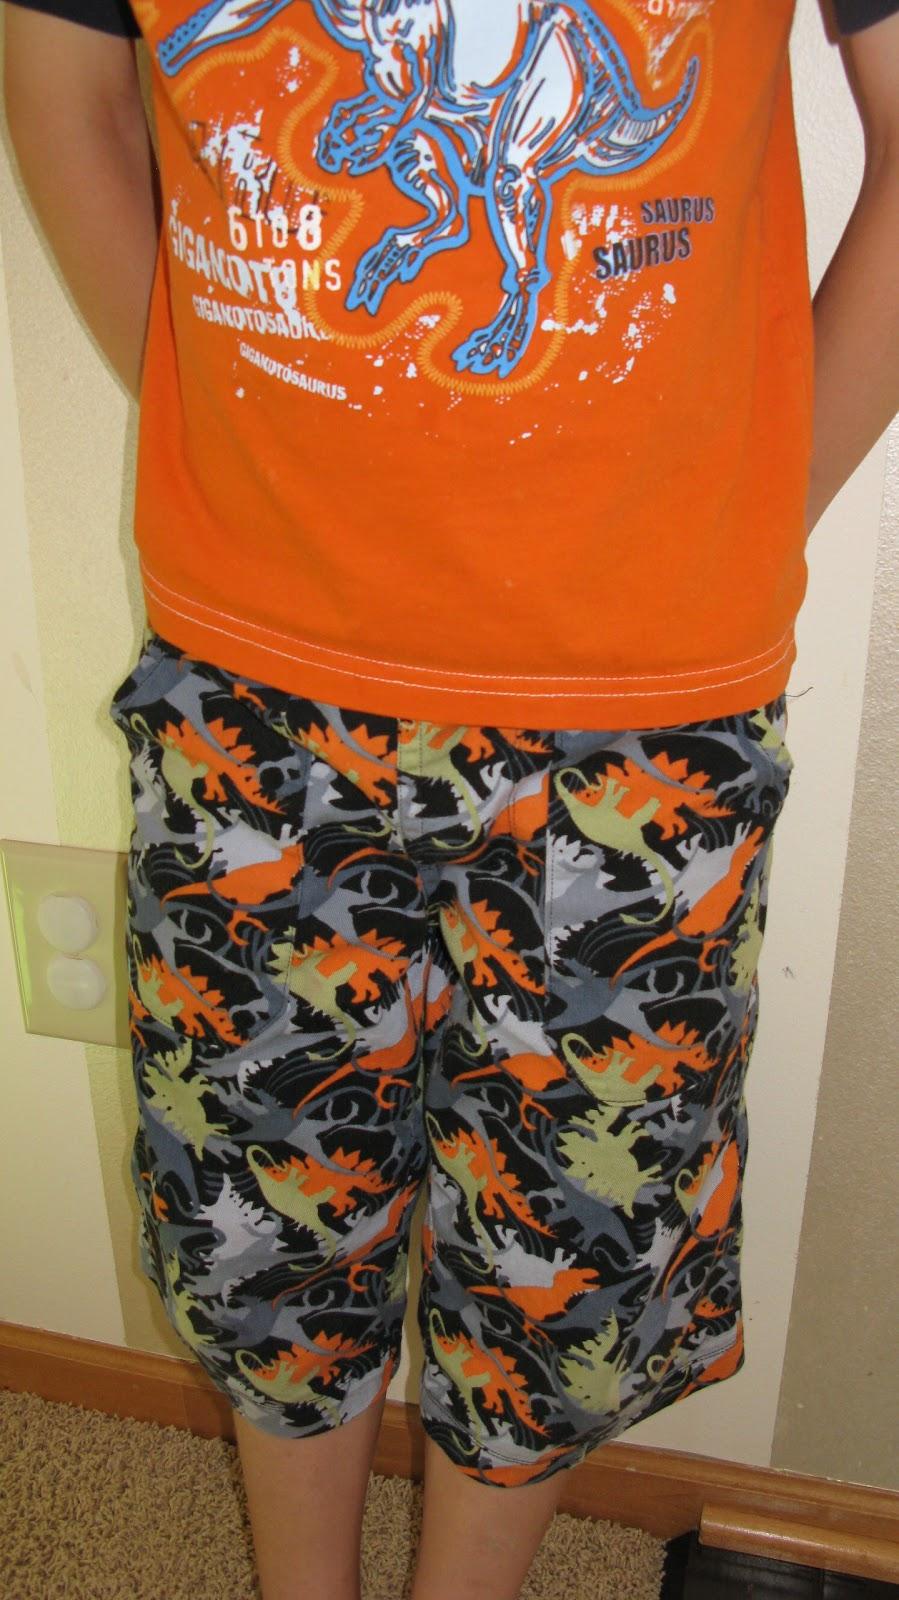 http://olga-kidapproved.blogspot.com/2012/07/crazy-shorts.html